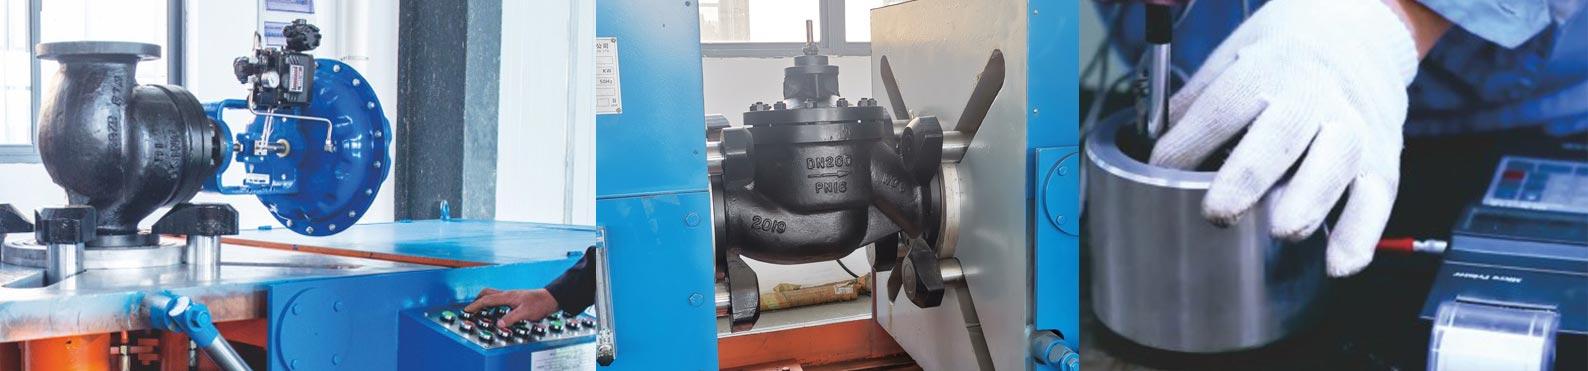 globe-control-valve-test